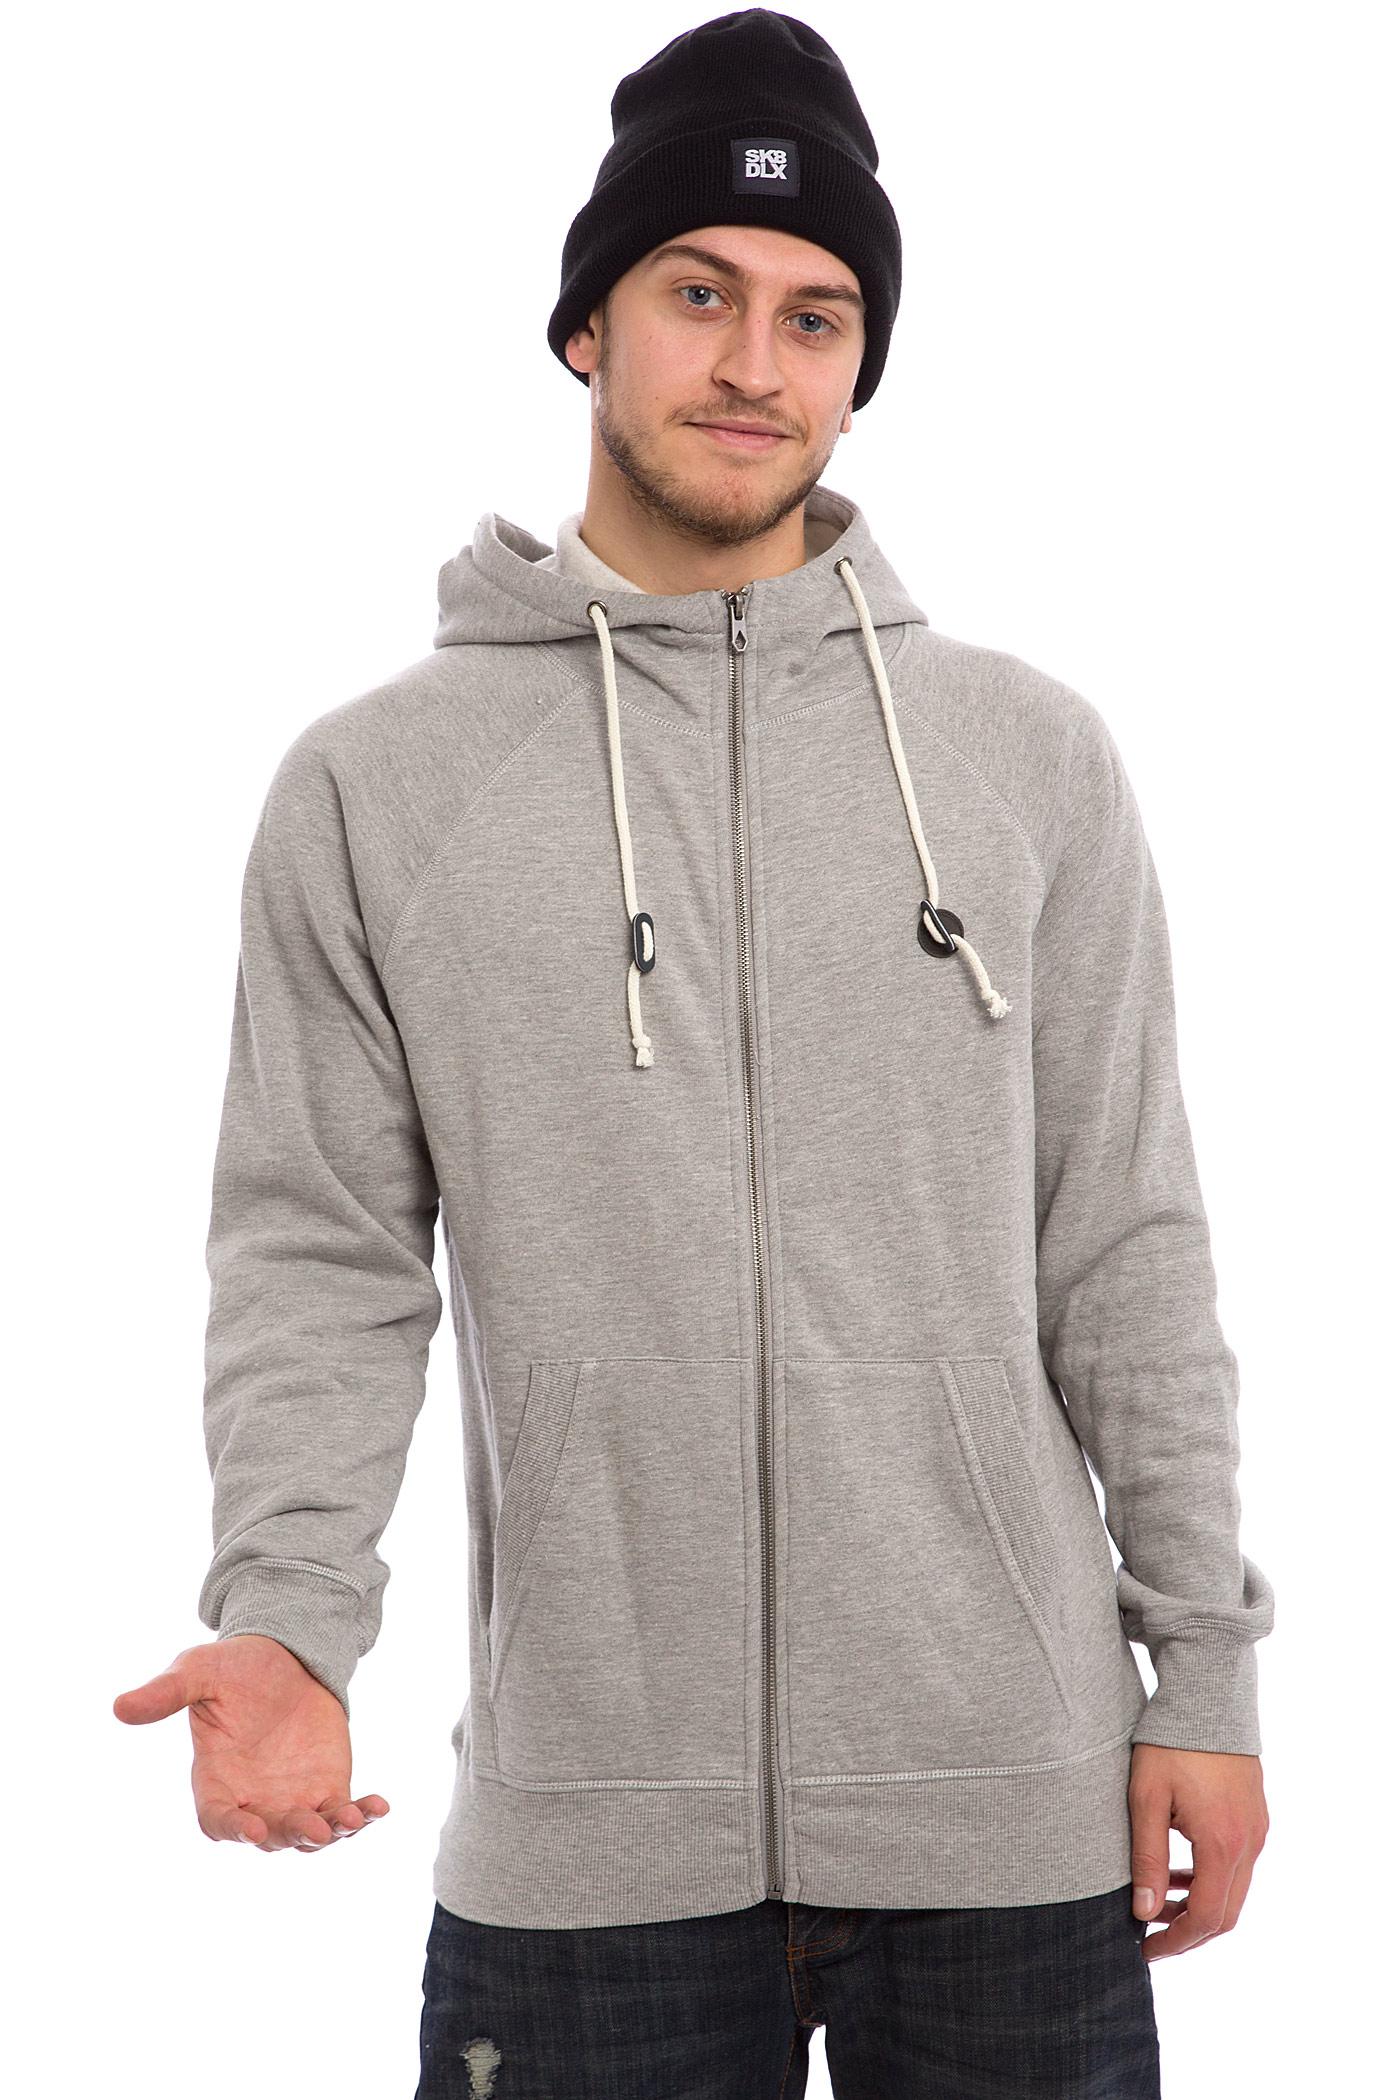 Volcom hoodies